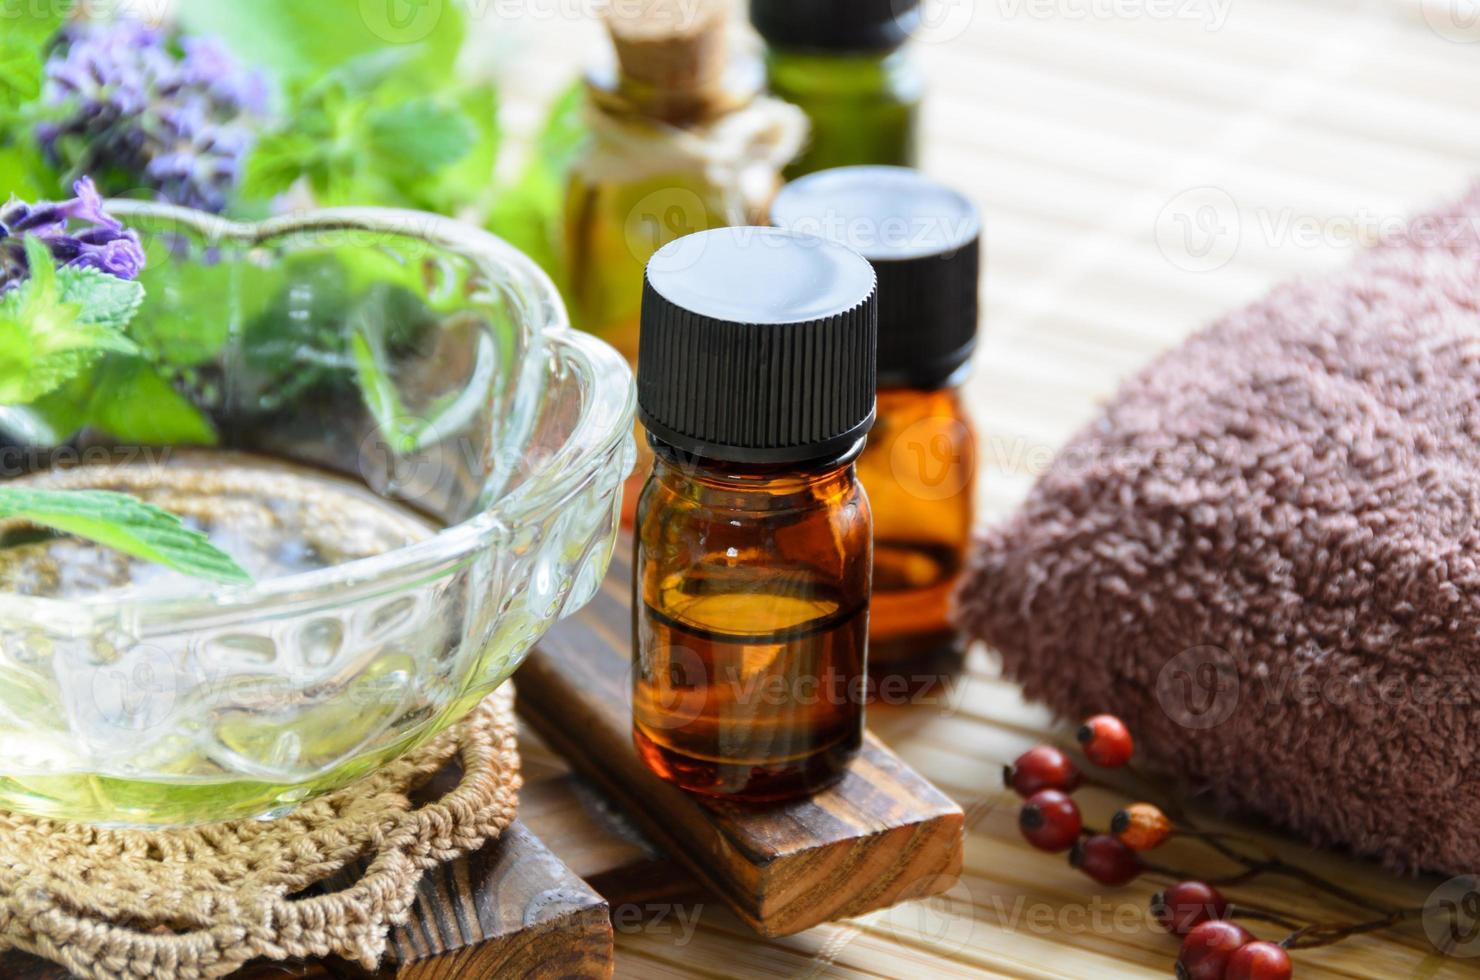 aromatherapy treatment with herbs photo